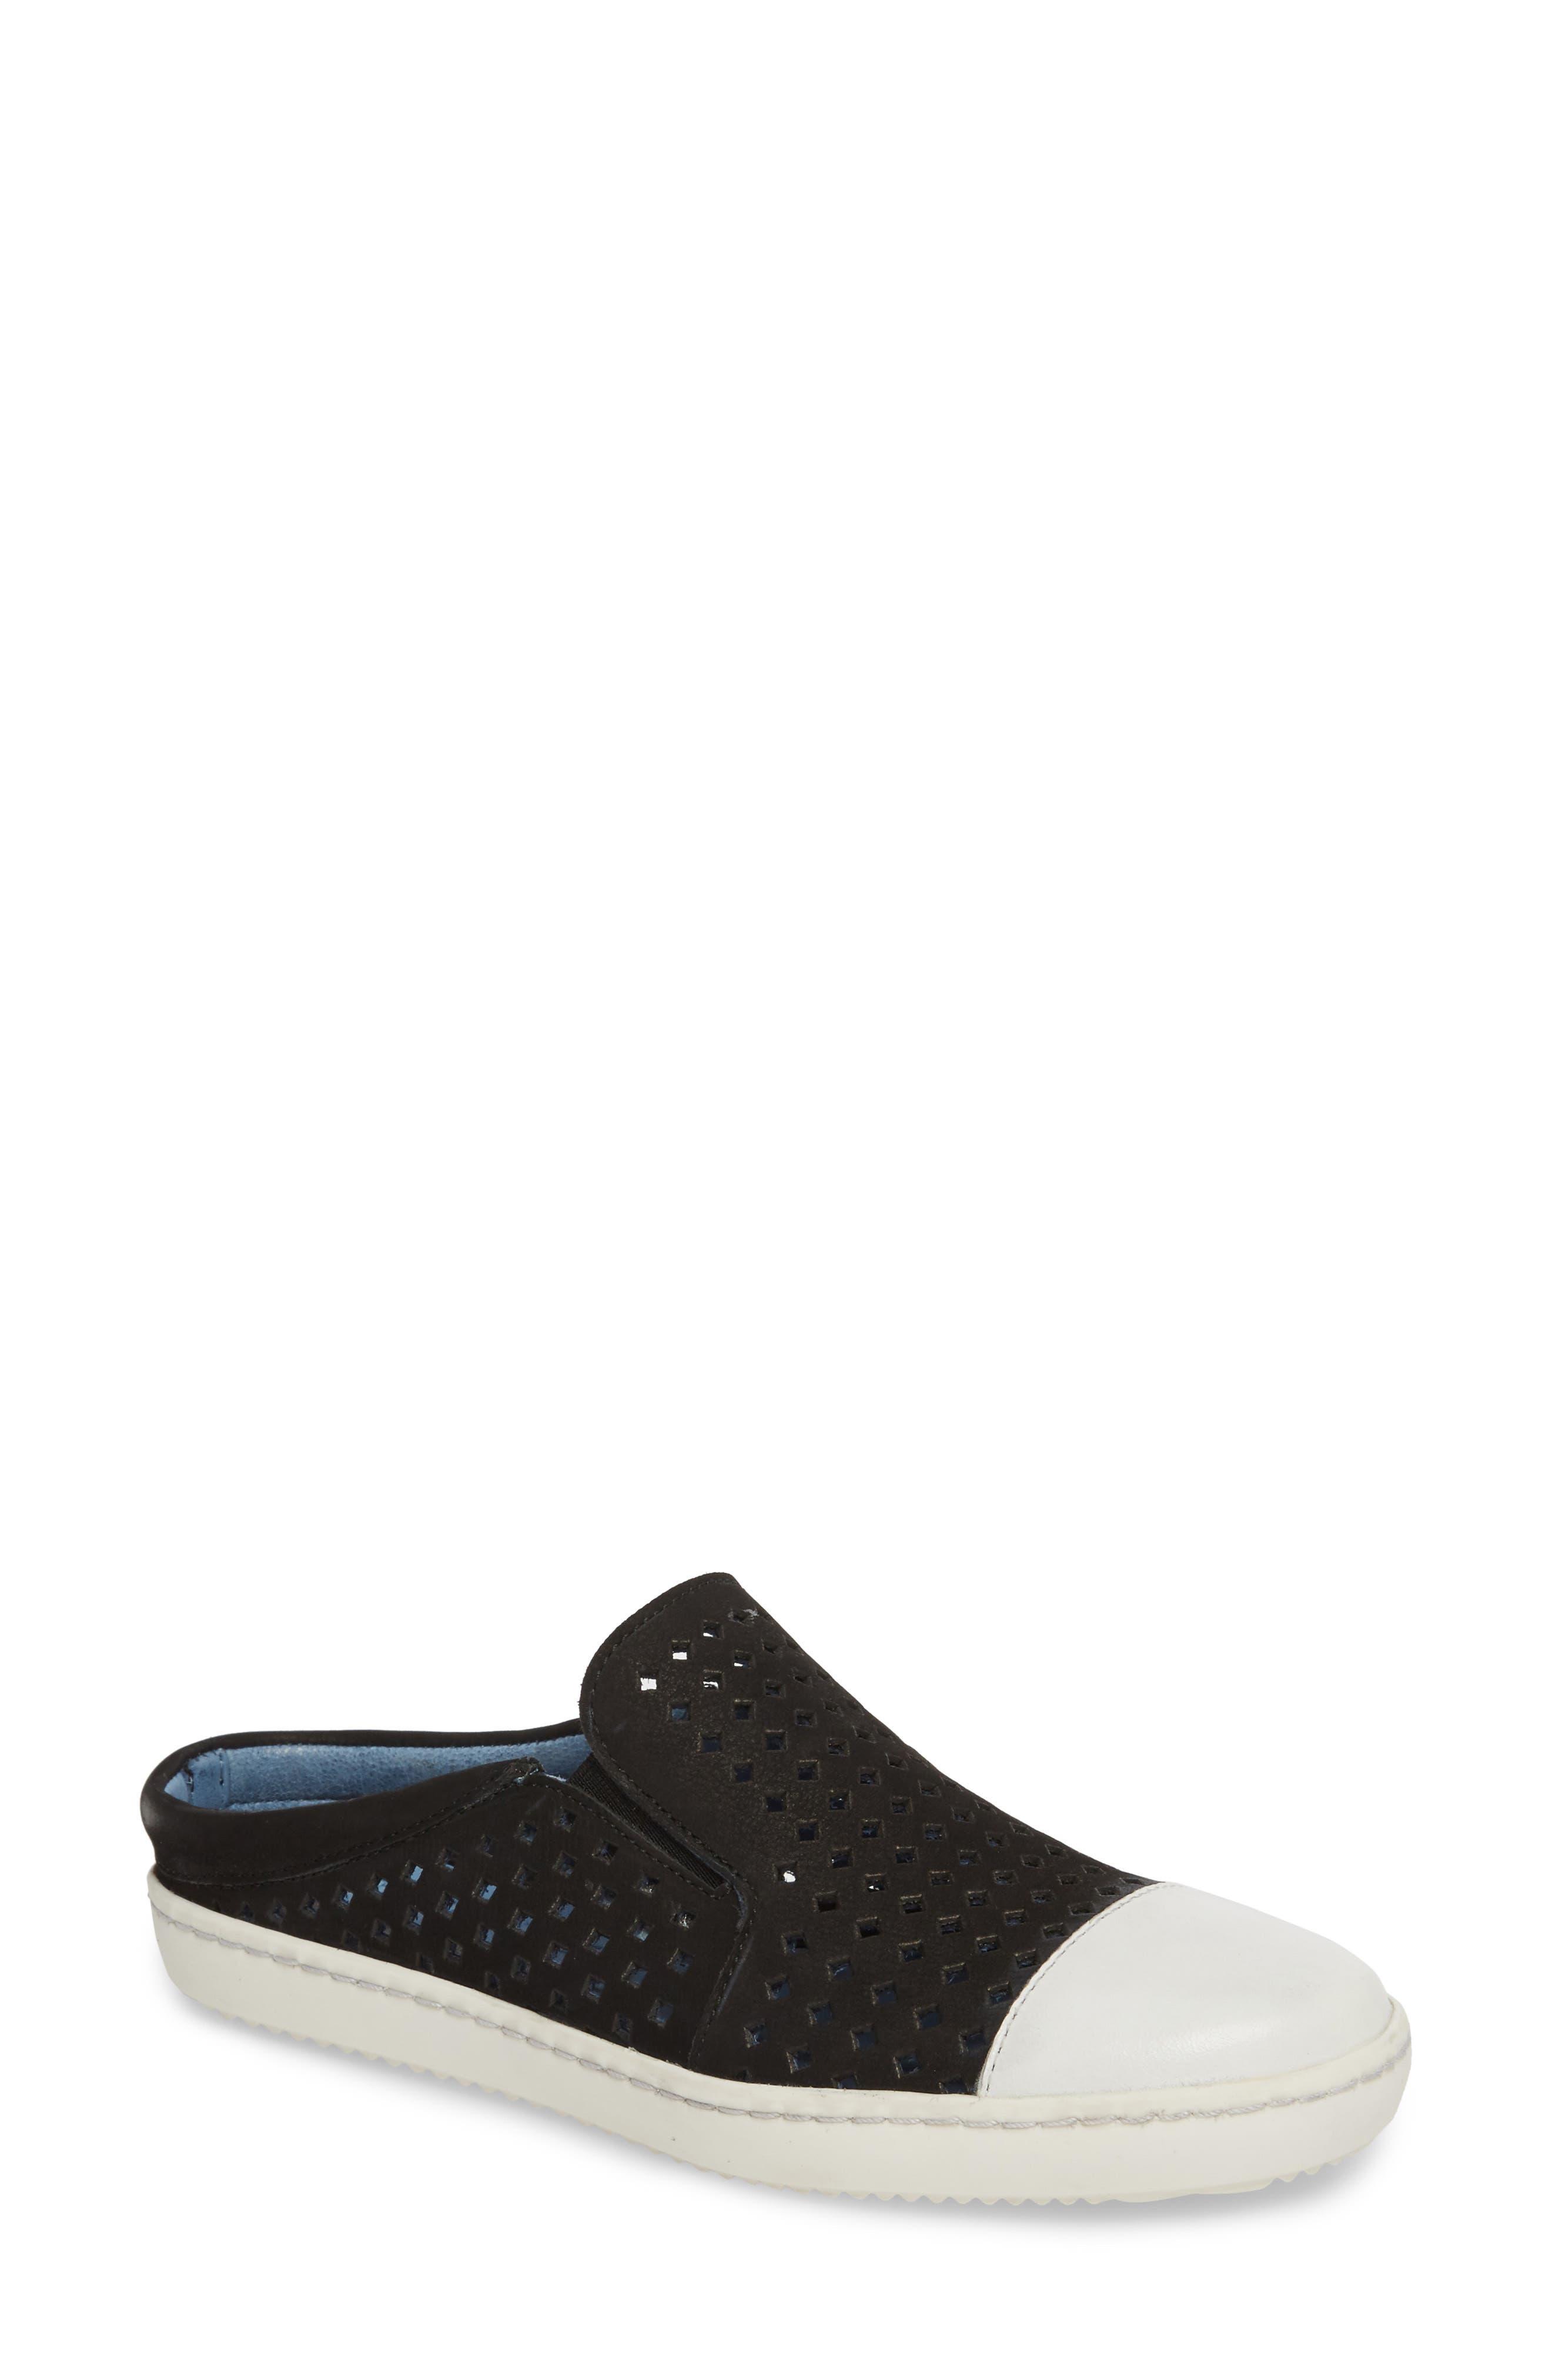 Tippy Slip-On Sneaker,                             Main thumbnail 1, color,                             003